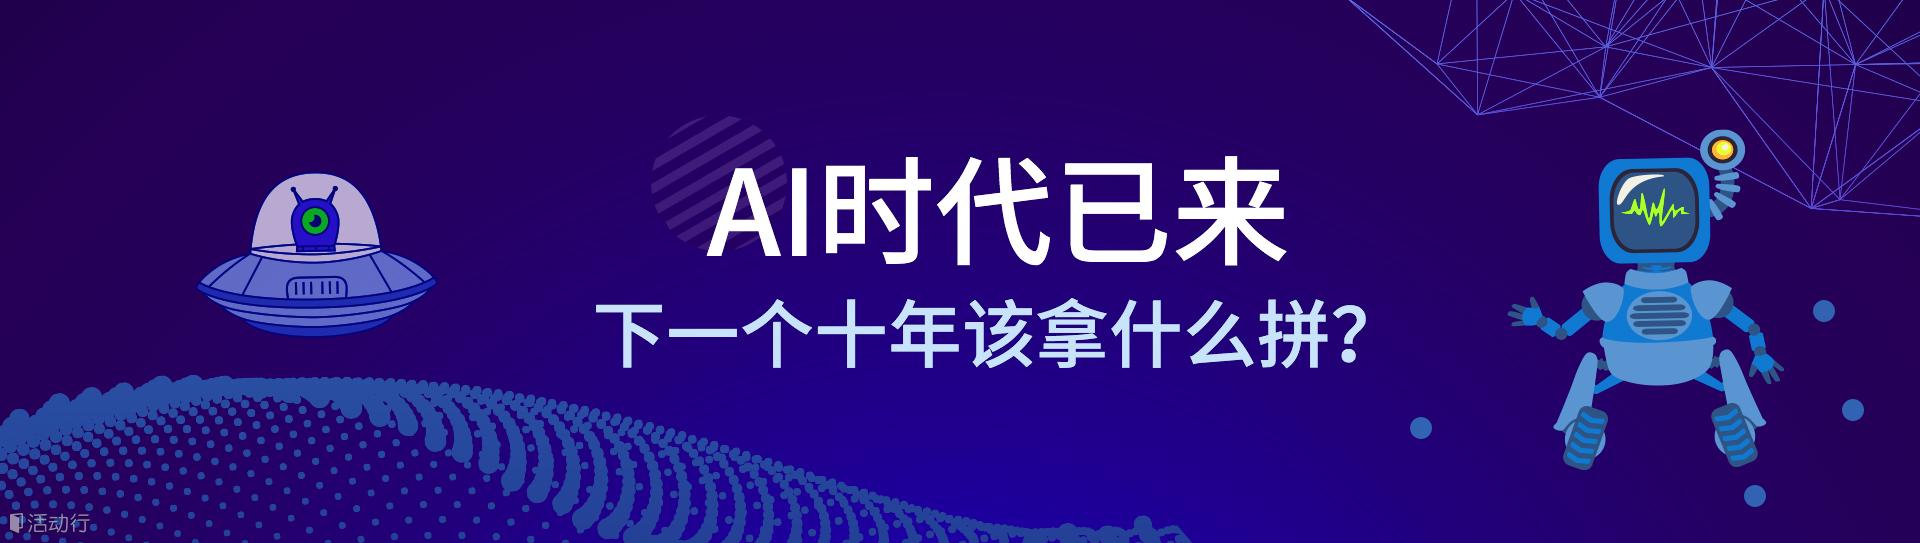 AI时代已来,下一个十年该拿什么拼?